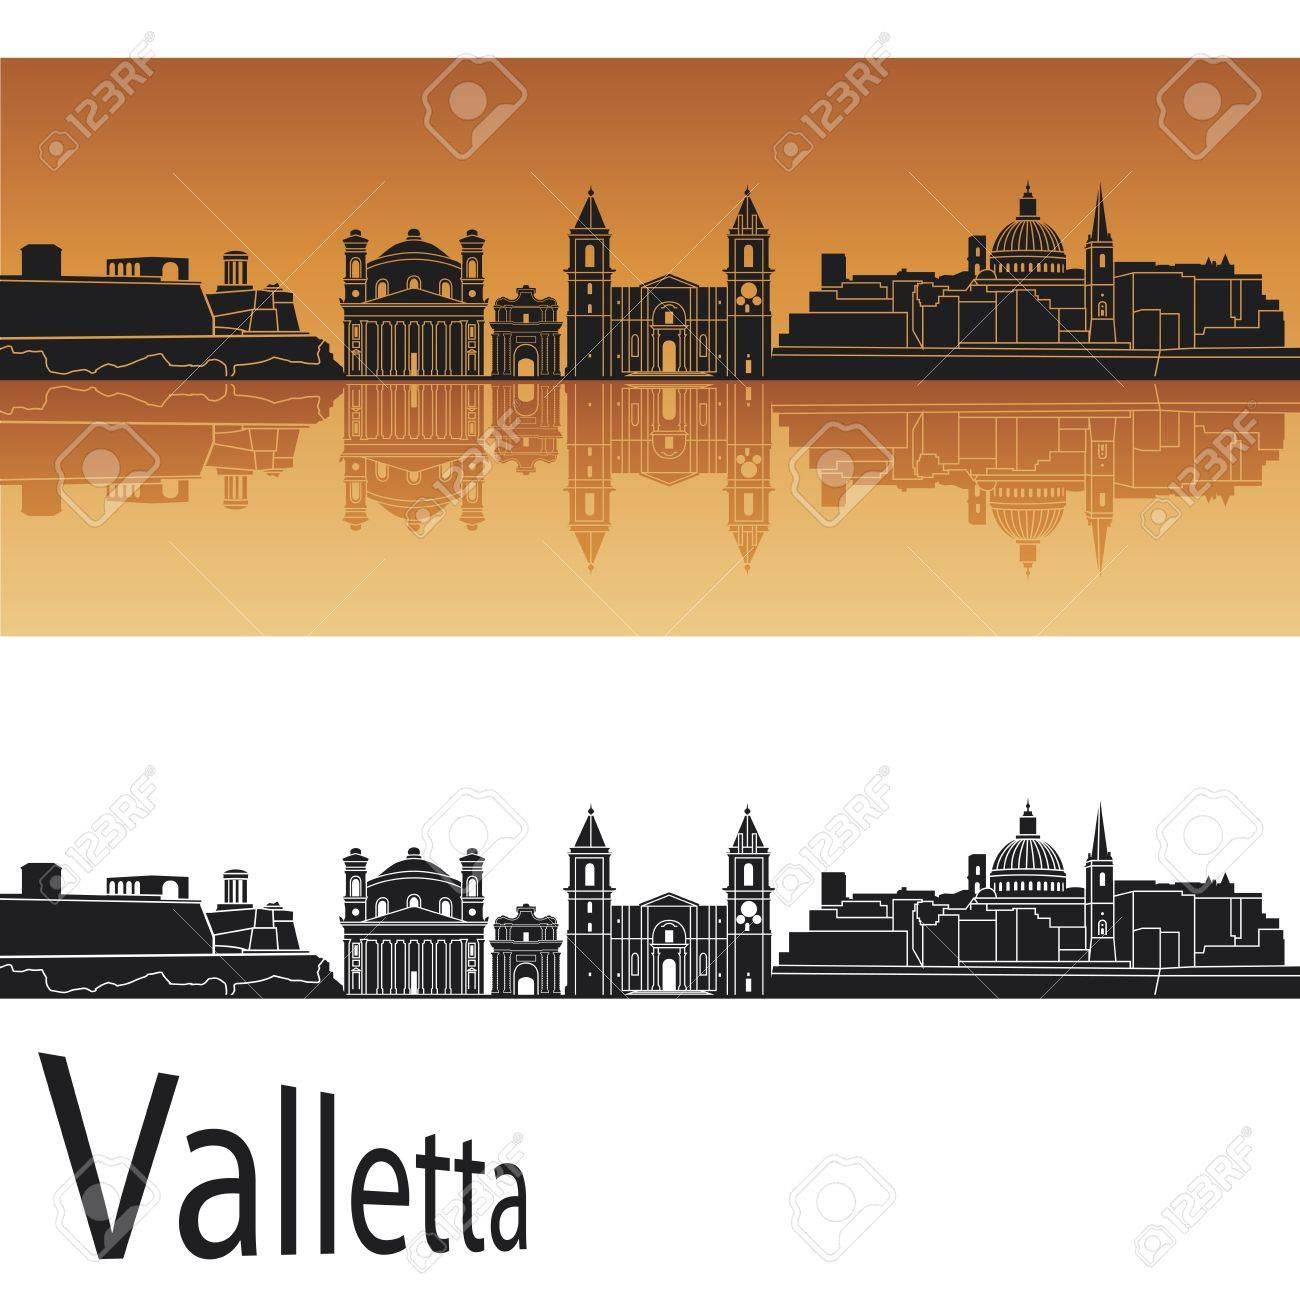 Valletta skyline in orange background in editable vector file Stock Vector - 13696093